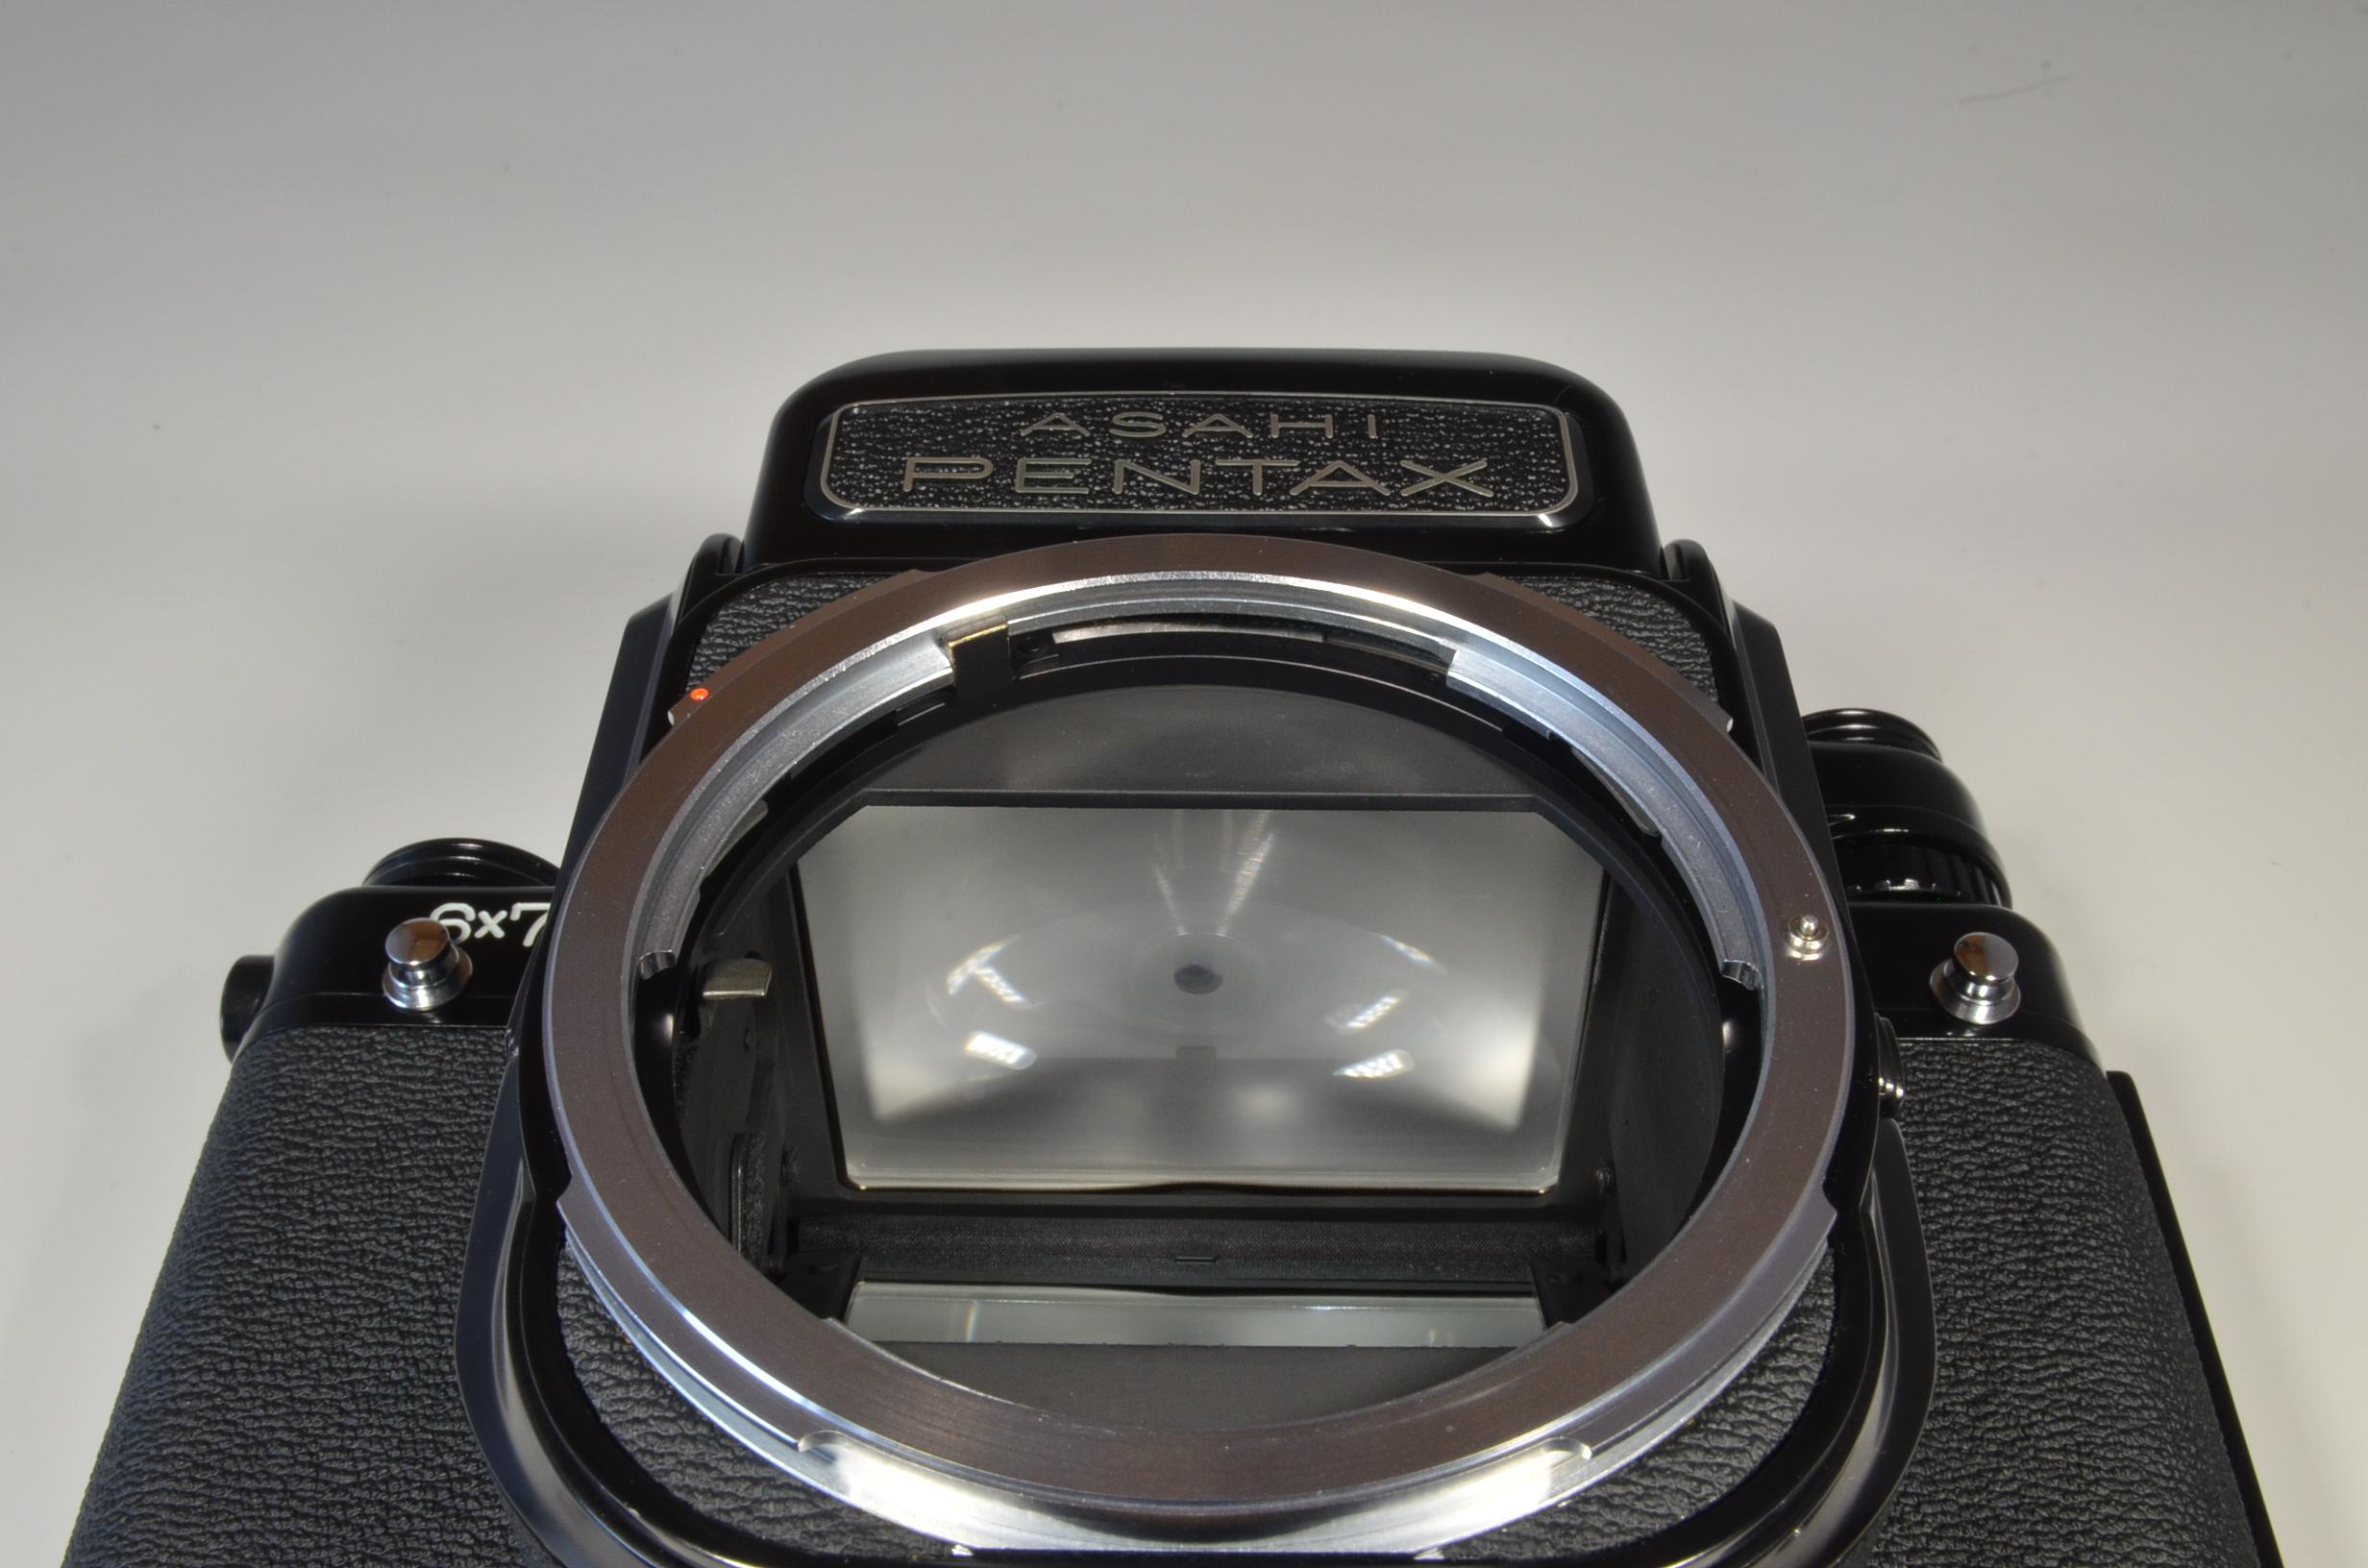 pentax 6x7 67 / smc 105mm f2.4 / 45mm f4 / ph-sb / national pe-480sg